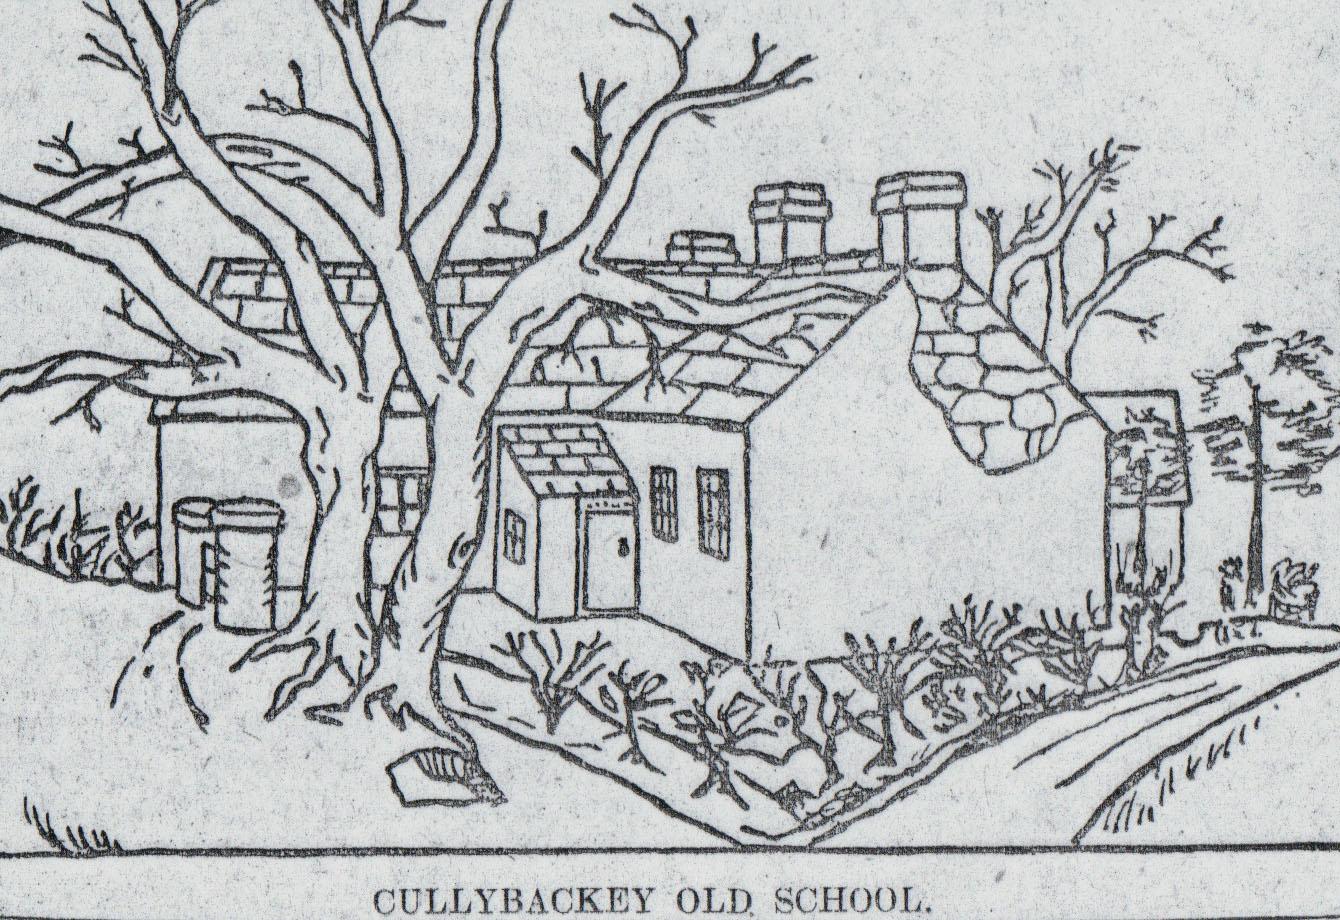 photo-1-cullybackey-old-school